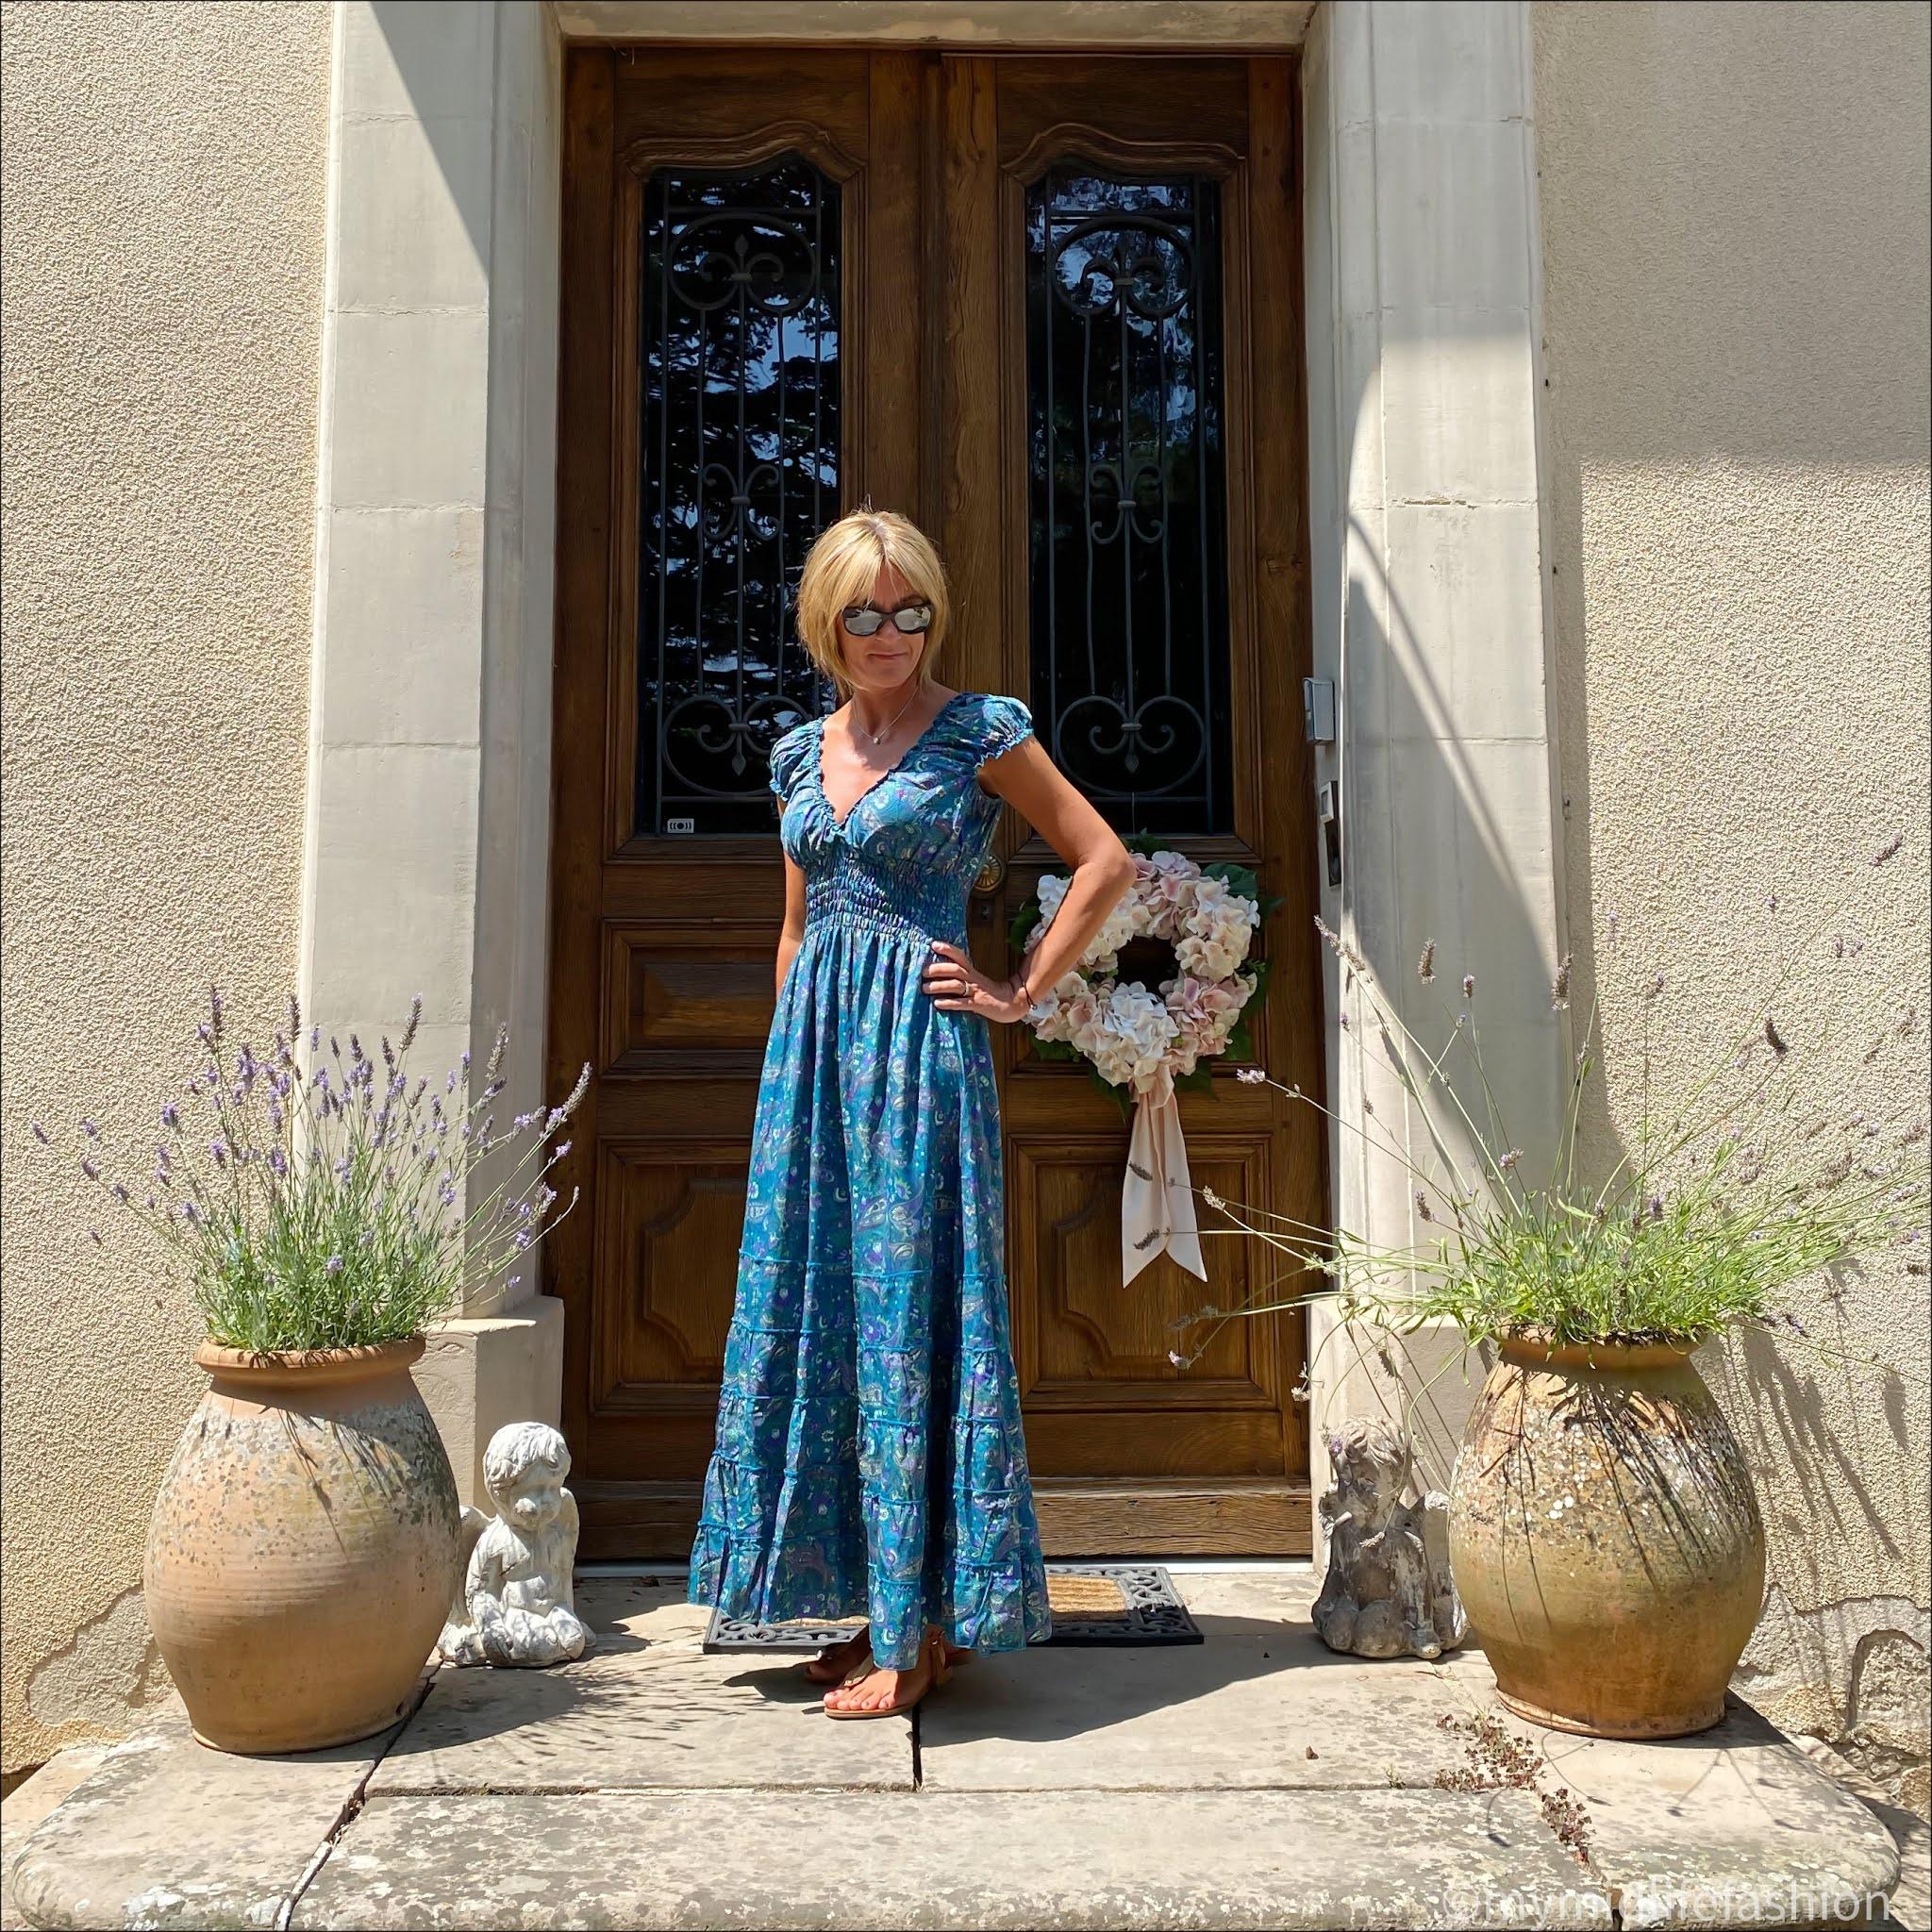 my midlife fashion, Carmela leather thong sandals, maxi patterned elastic dress